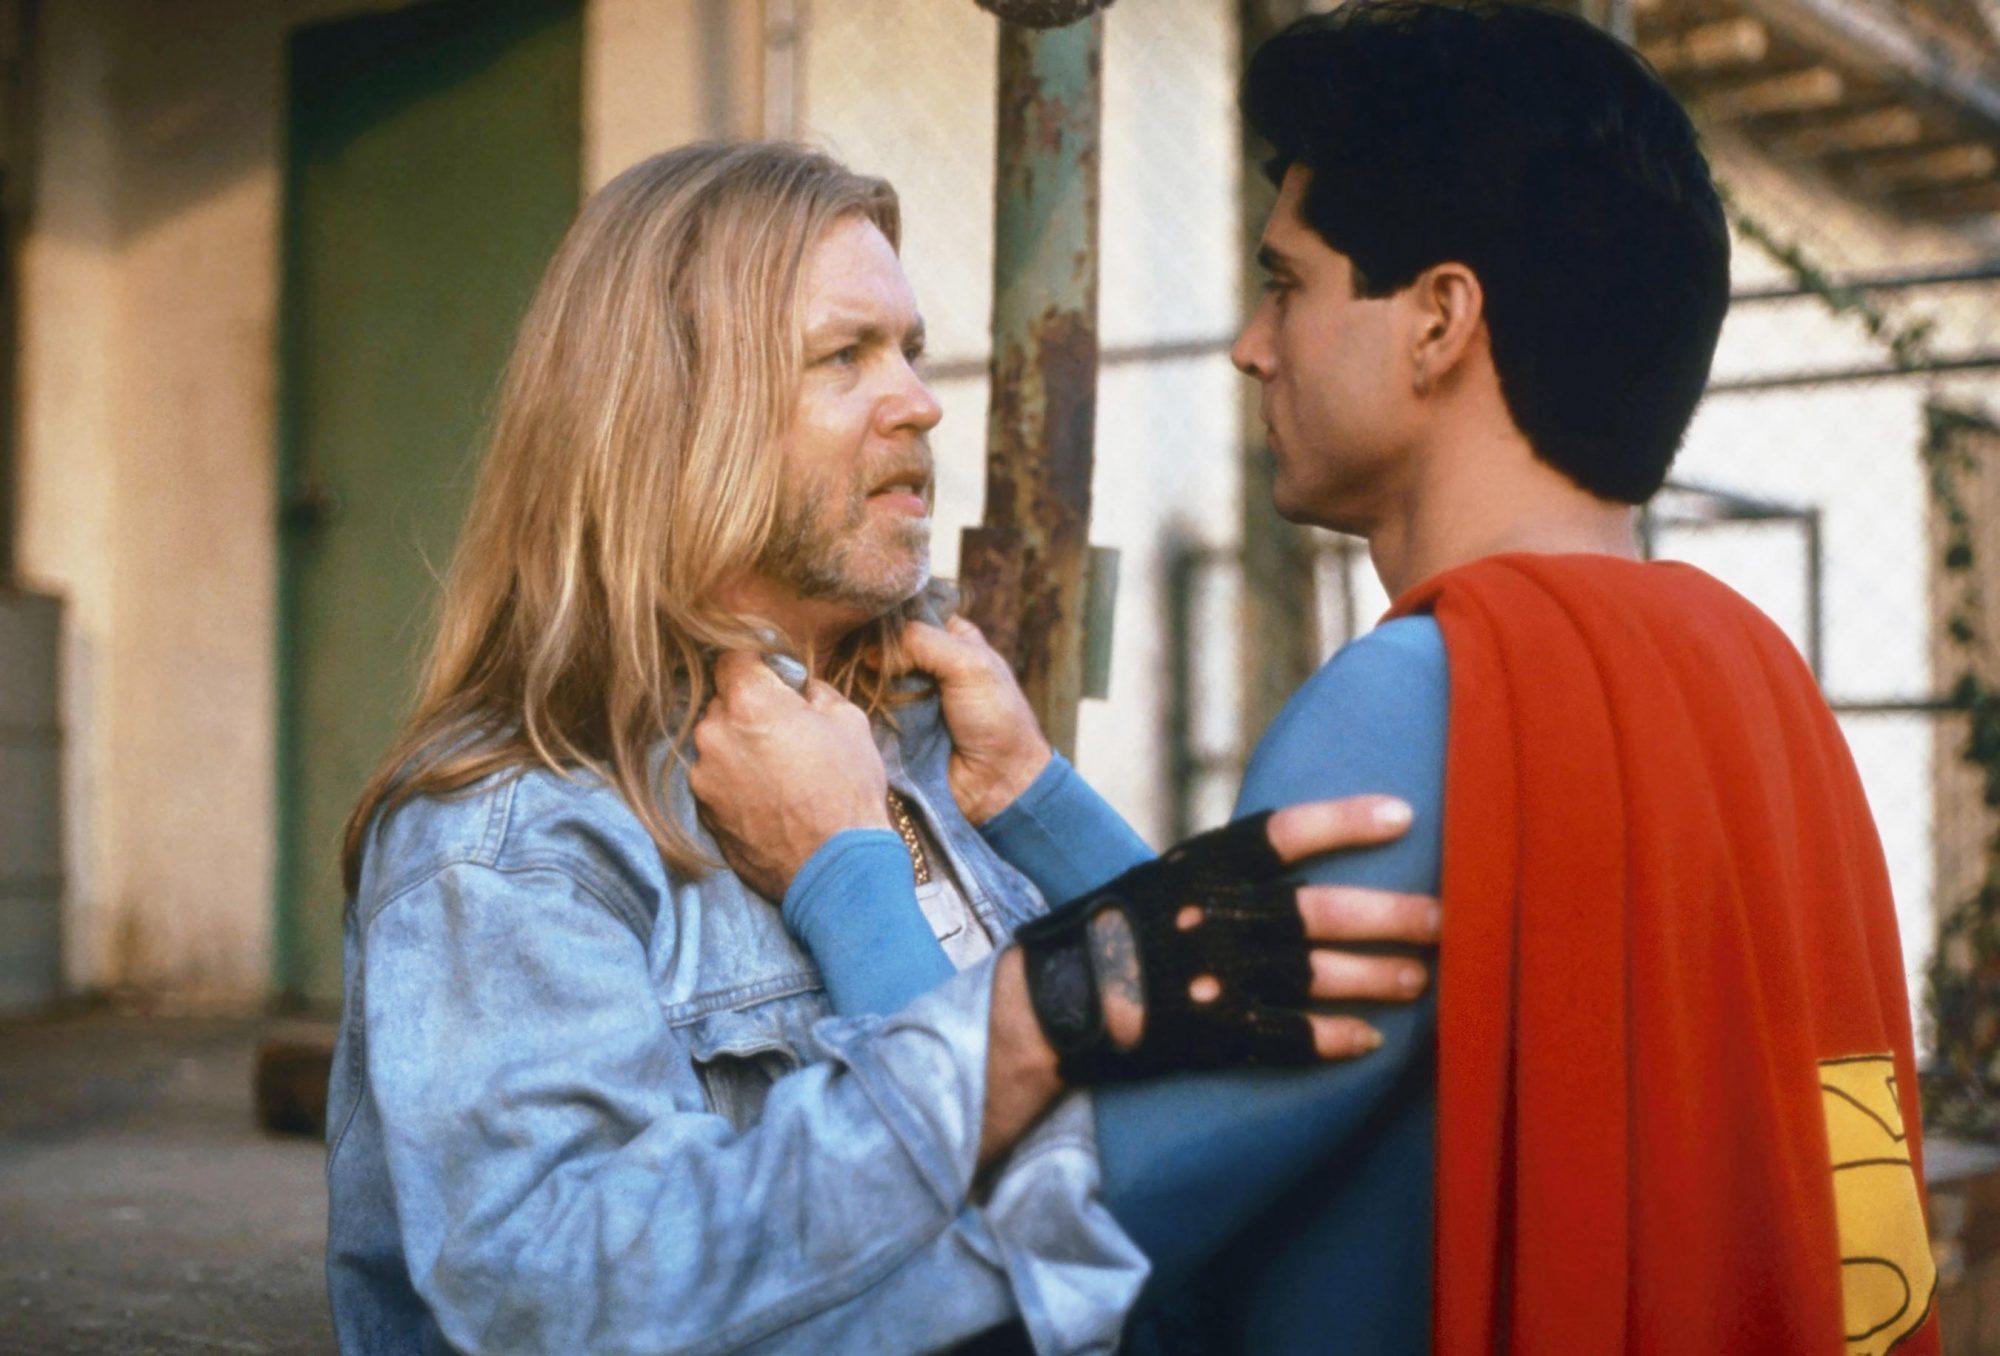 SUPERBOY, from left: Gregg Allman, Gerard christopher, 'Carnival,' (season 3, episode 8, aired